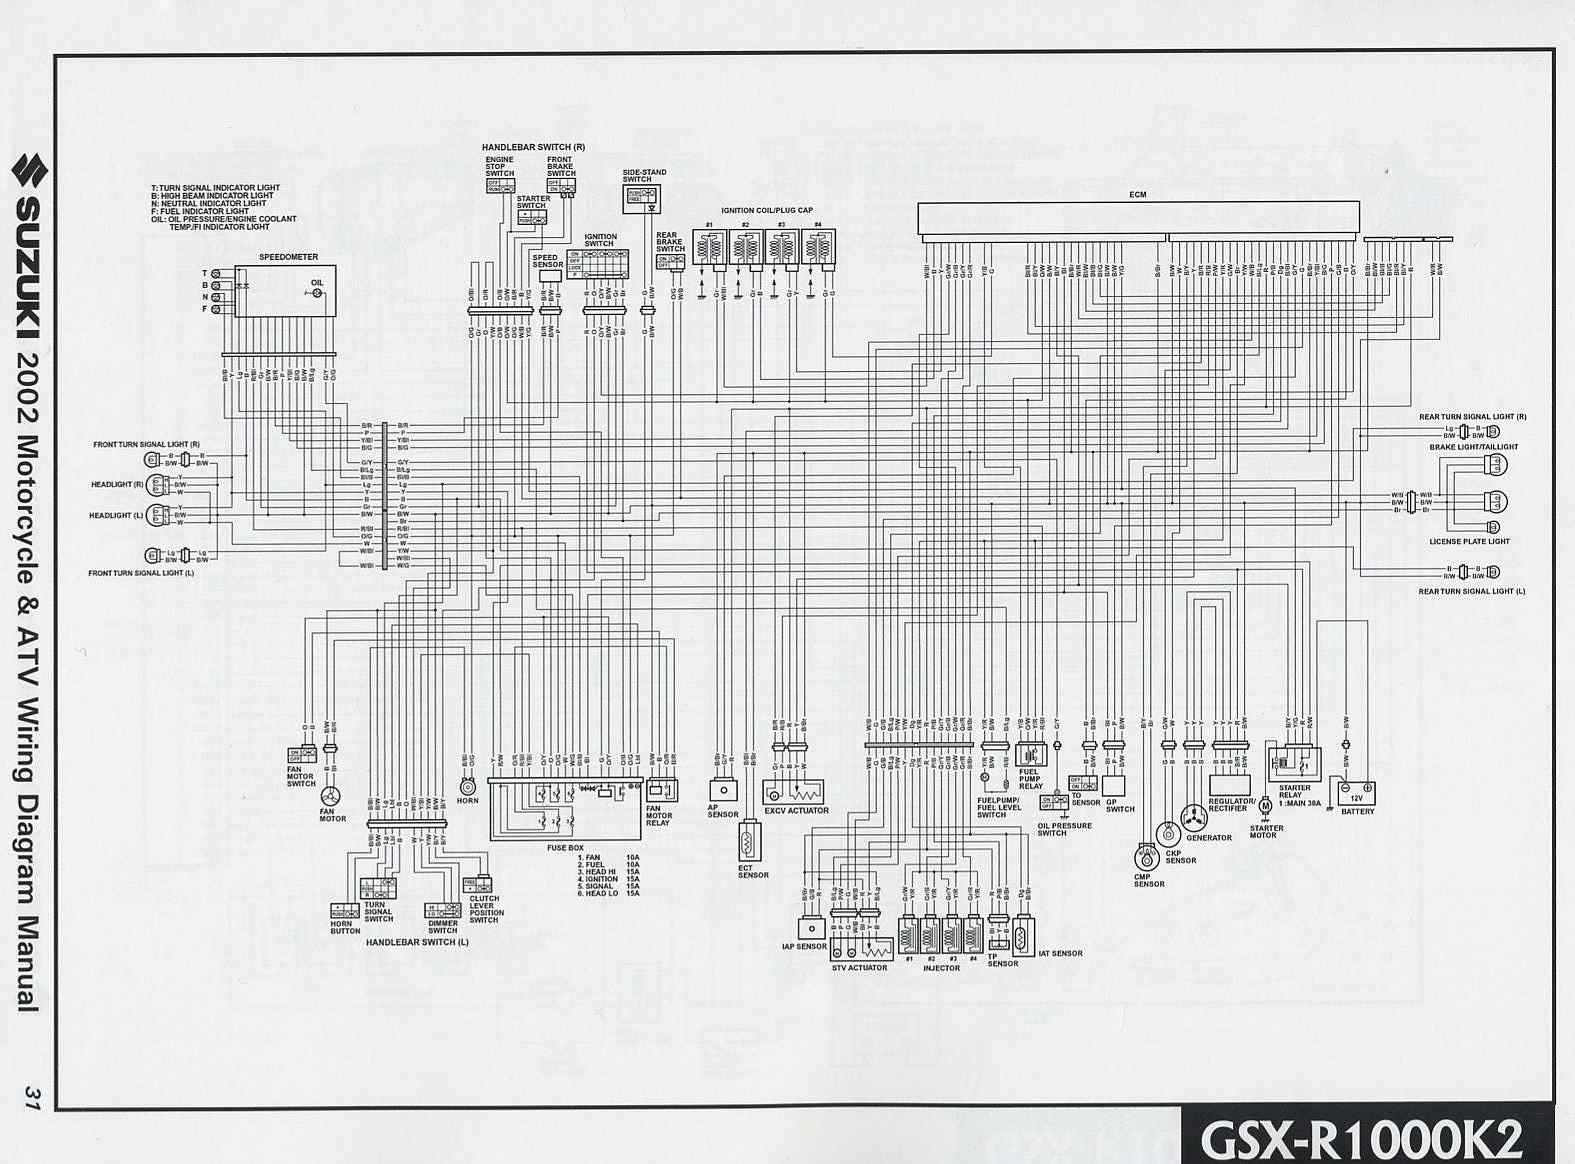 Suzuki+GSX R1000+K2+2002+Motorcycle+Wiring+Diagram?resize\=665%2C491 2002 gsxr 600 wiring diagram 2005 gsxr 600 wiring diagram \u2022 free 2002 yamaha r6 wiring diagram at gsmx.co